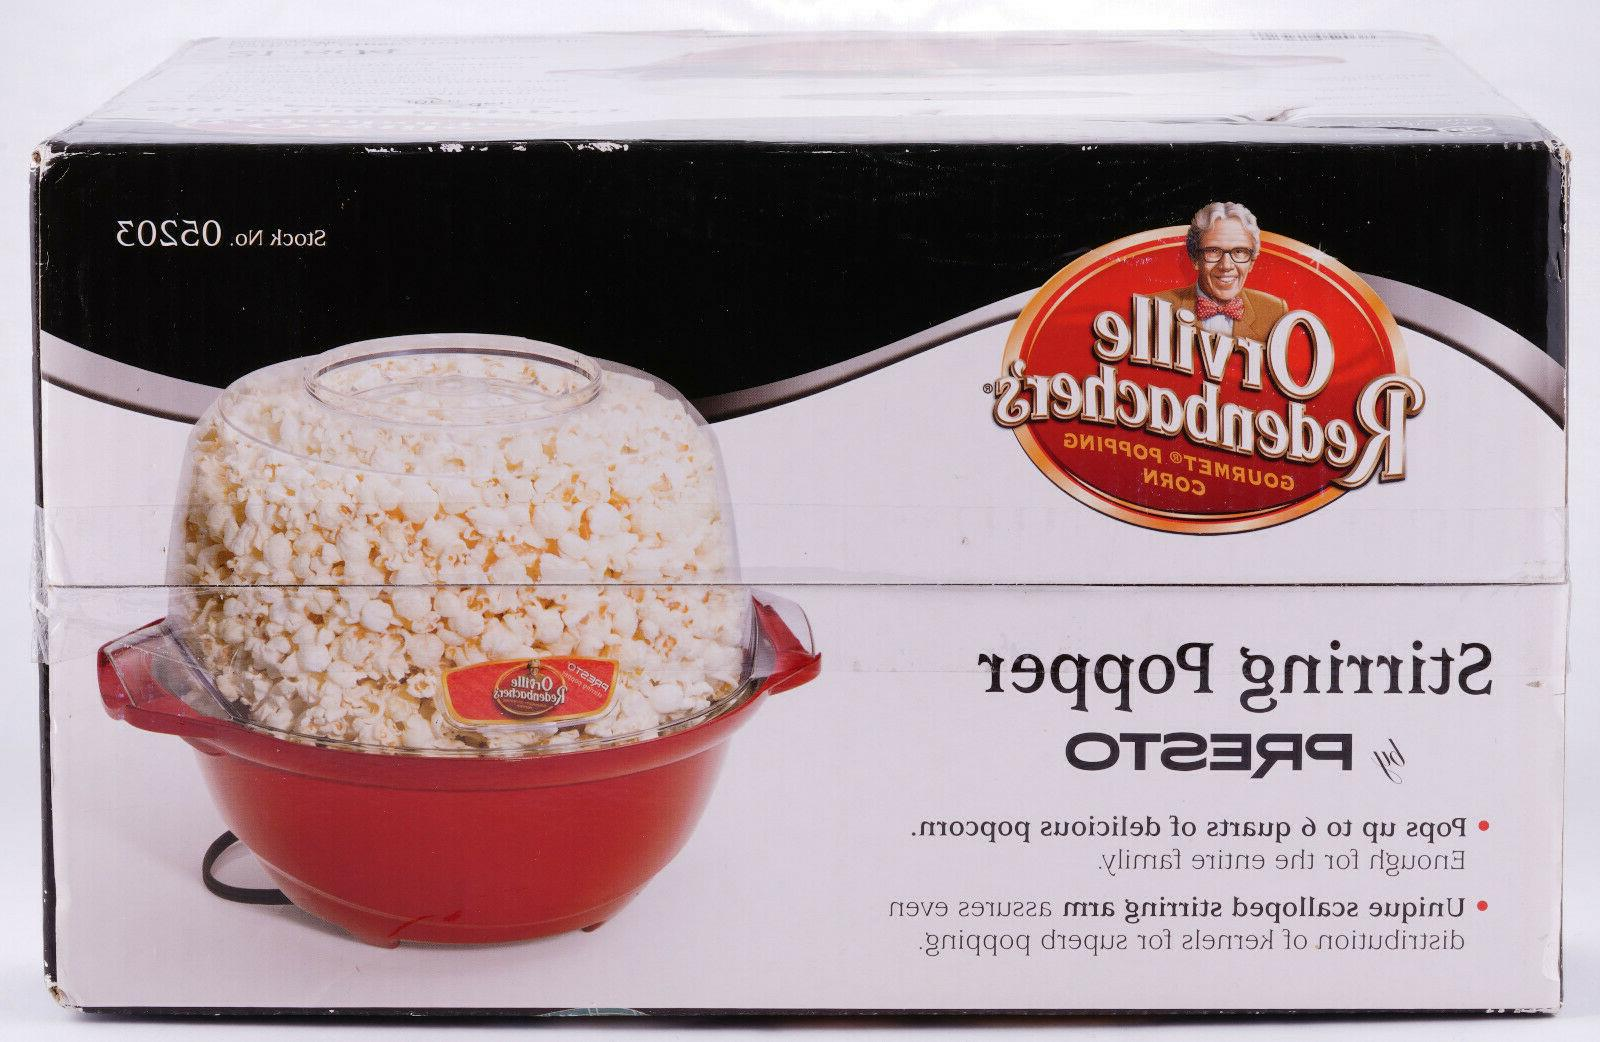 Popcorn Stirring Redenbacher's Presto Brand 😁